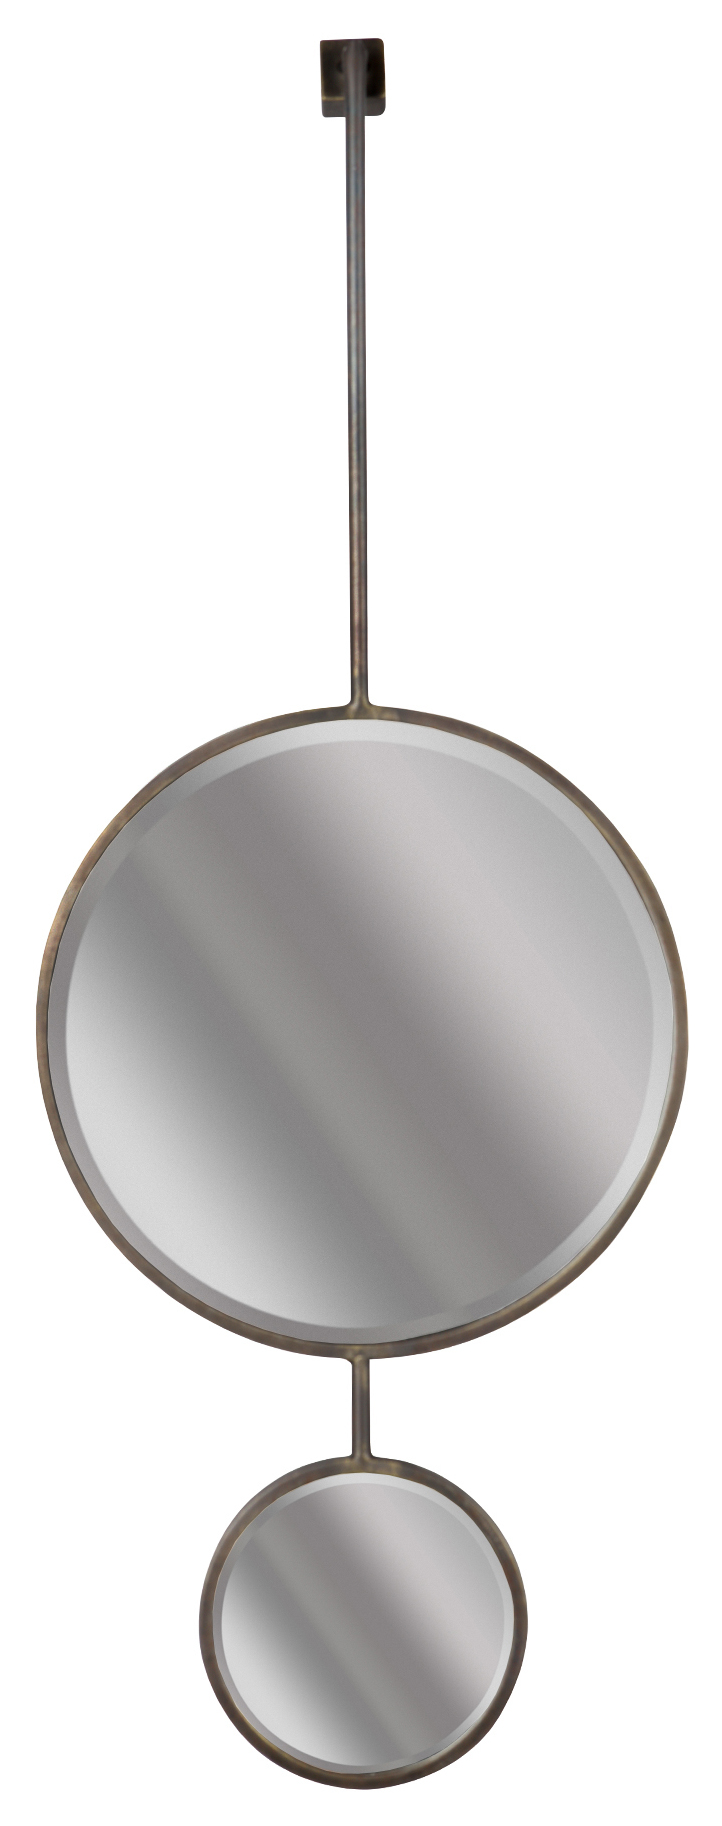 BePureHome Spiegel 'Chain' 108 x 40cm, kleur Antique Black Woonaccessoires | Spiegels kopen